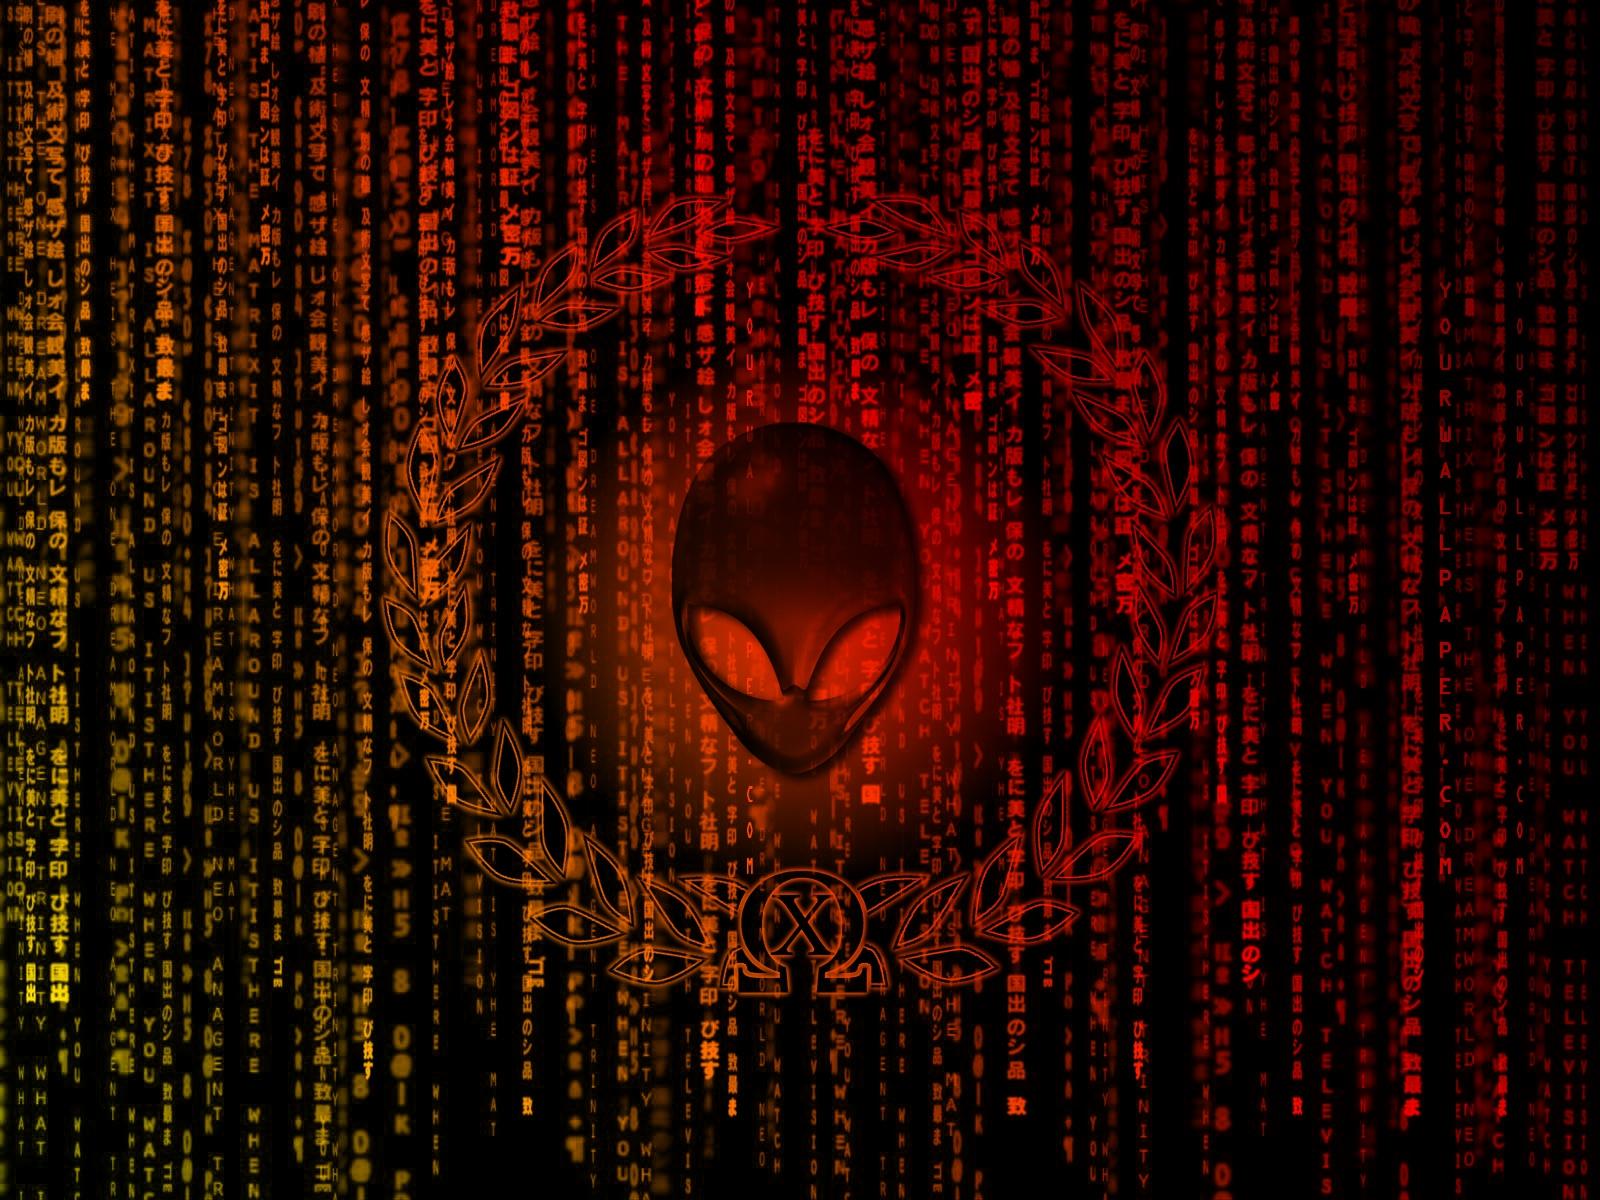 Alpha Coders Wallpaper Abyss Tecnologa Alienware 177549 1600x1200